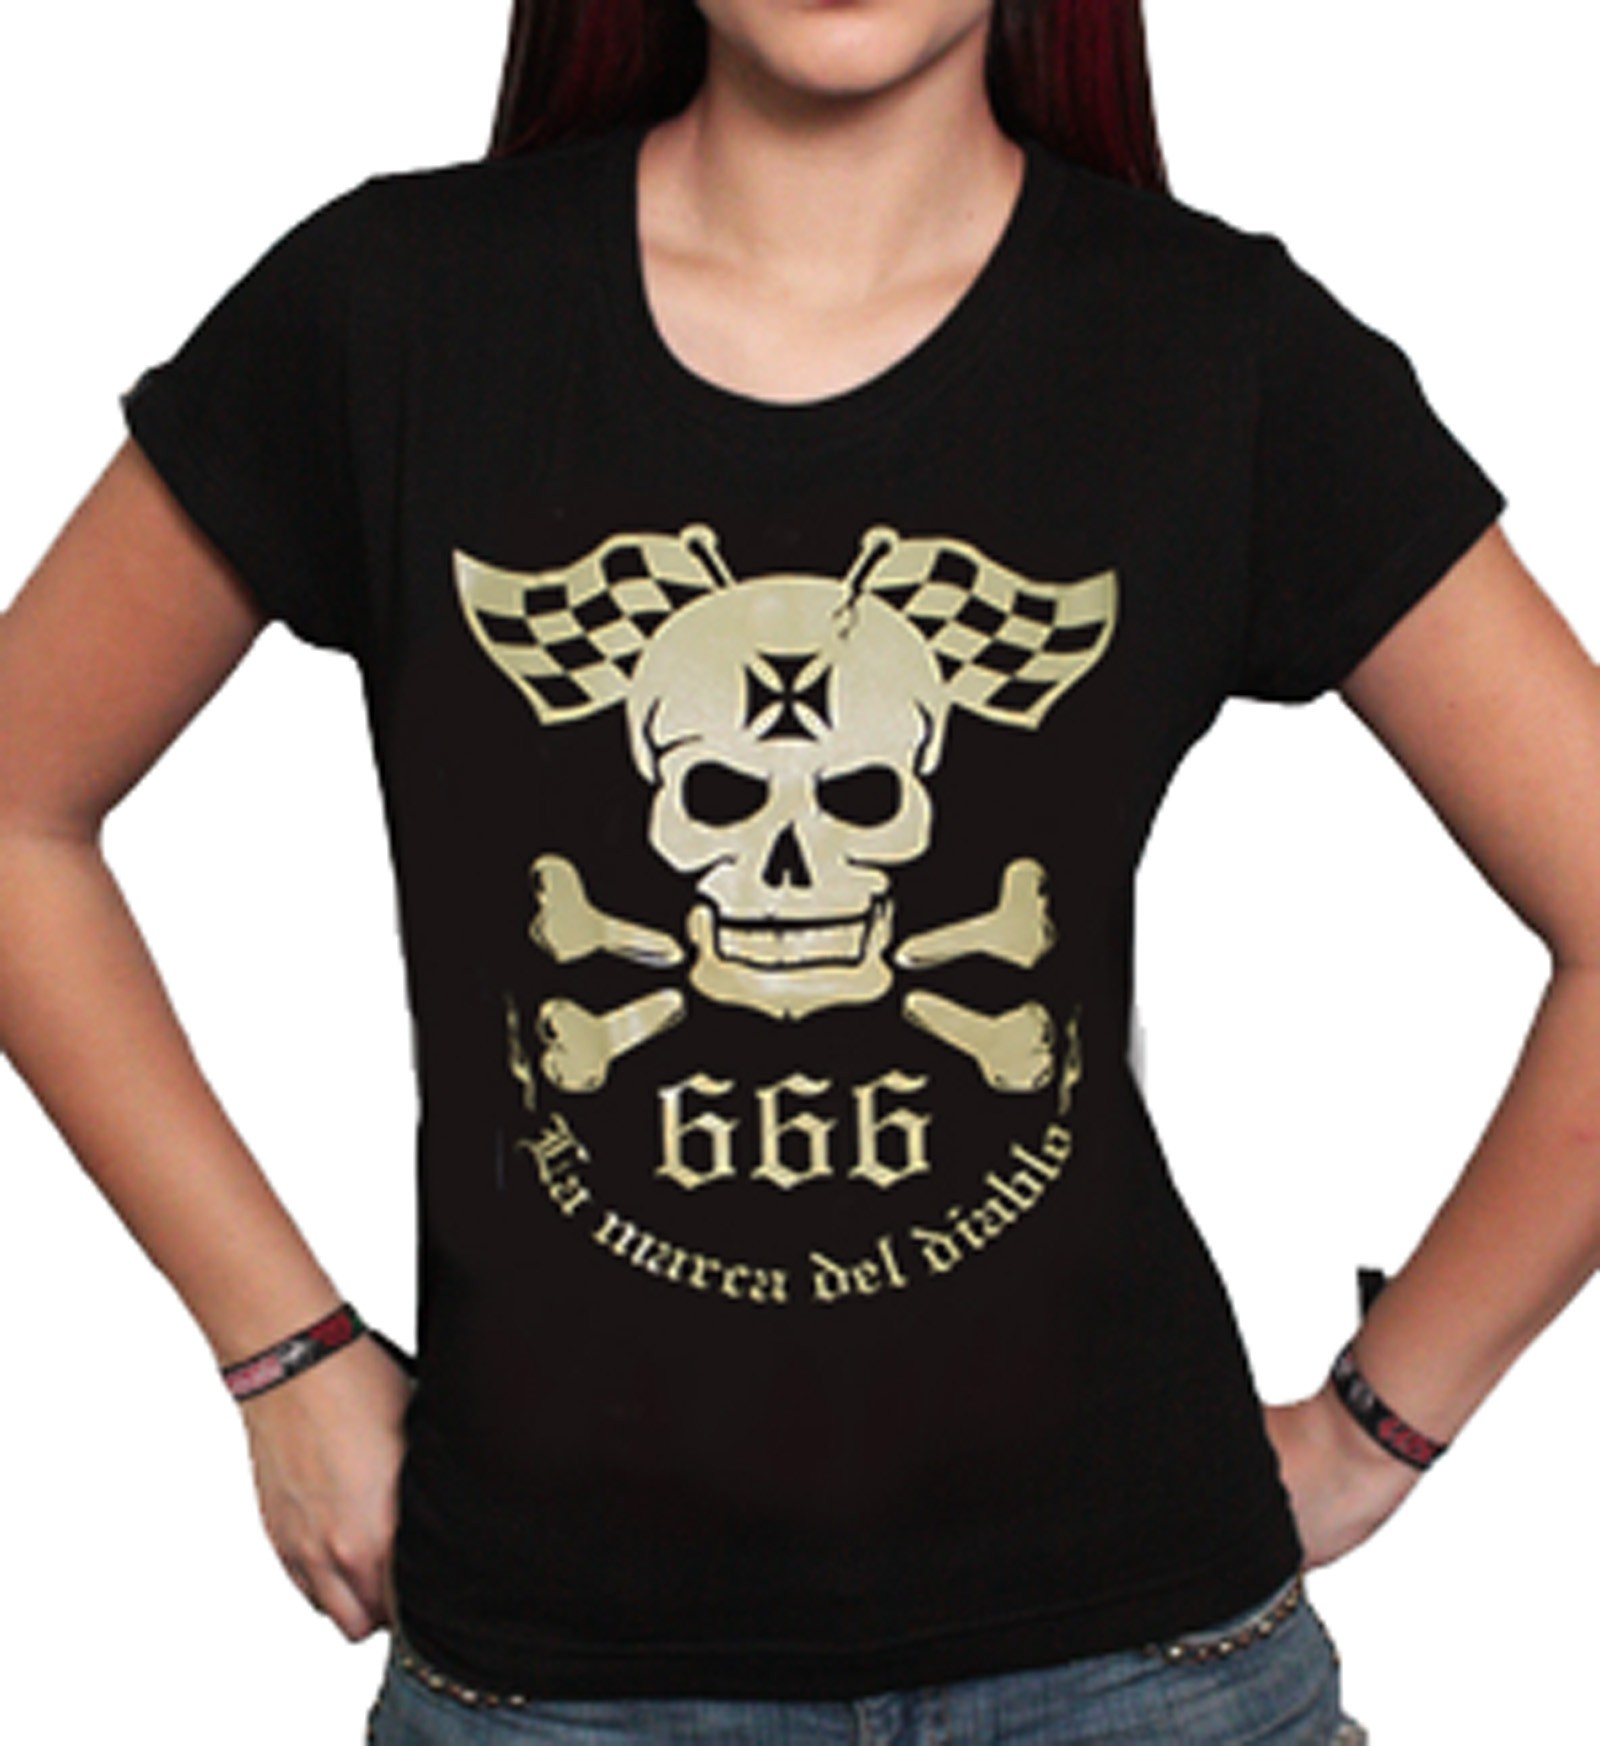 La Marca Del Diablo - LMDD Logo Skull T-Shirt Front